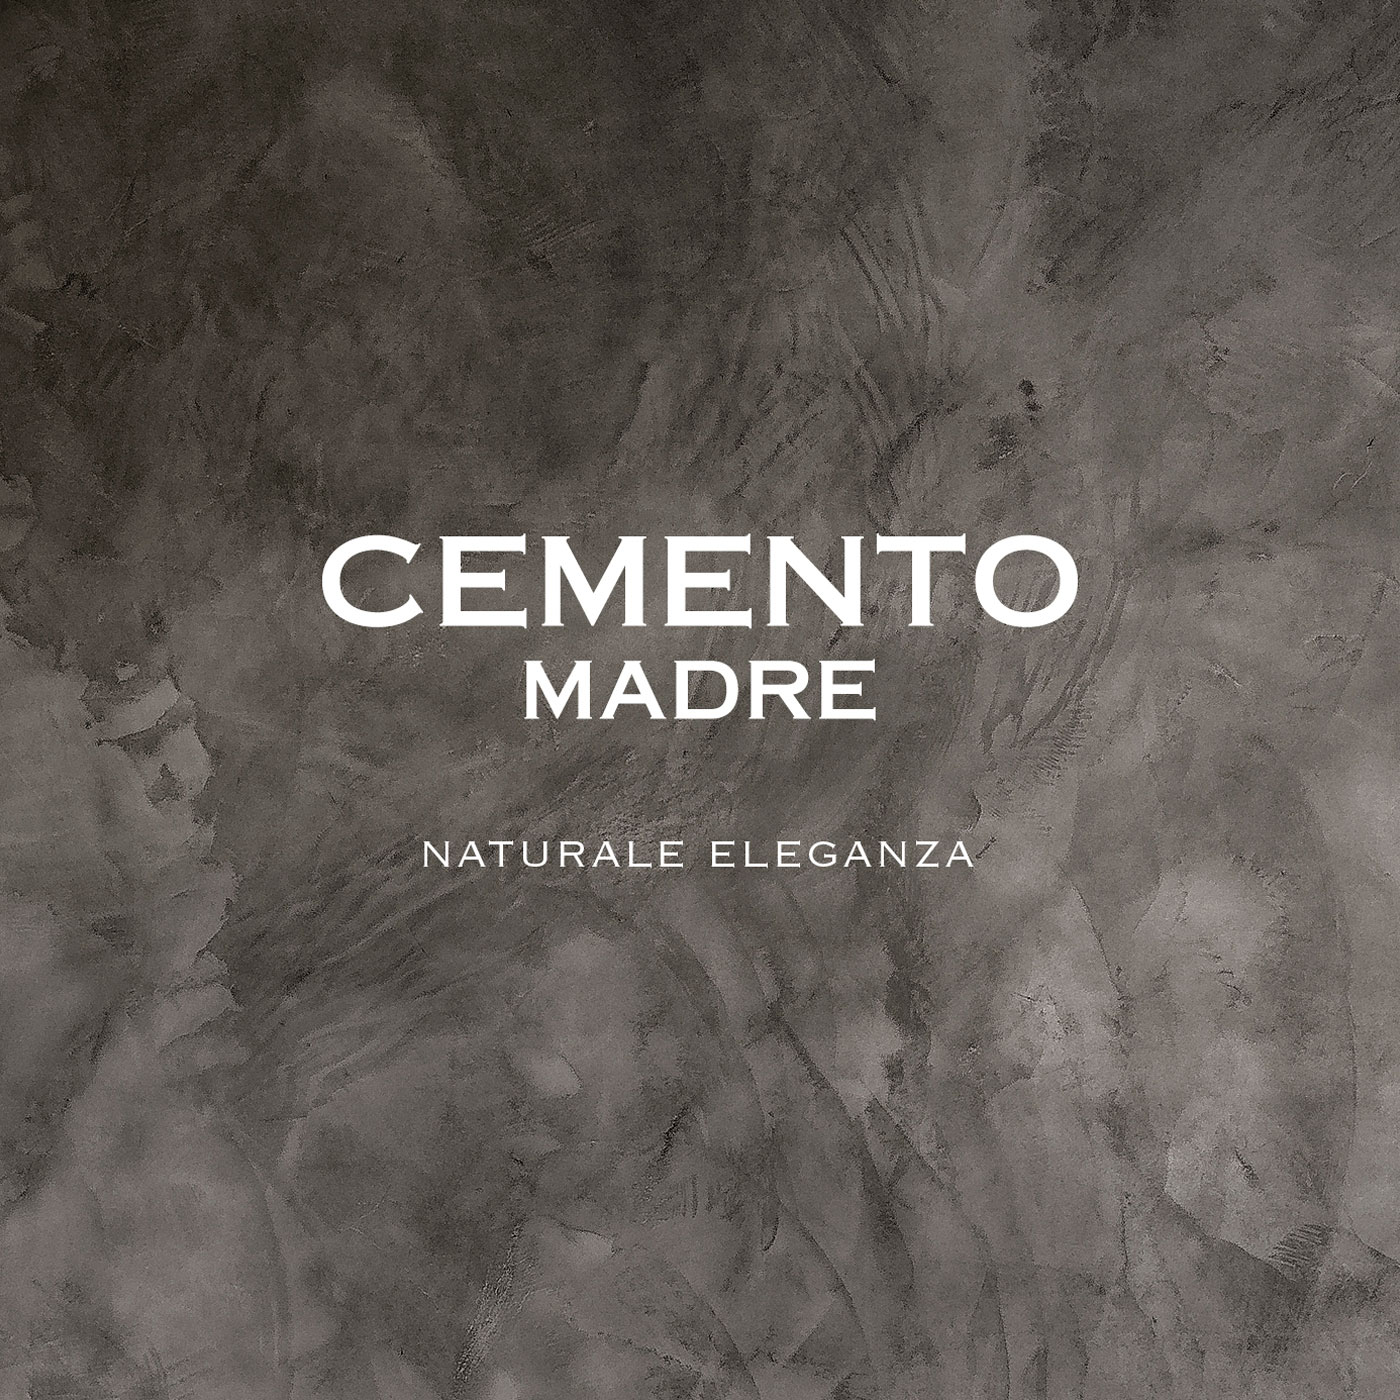 errelab-cemento-madre-r2